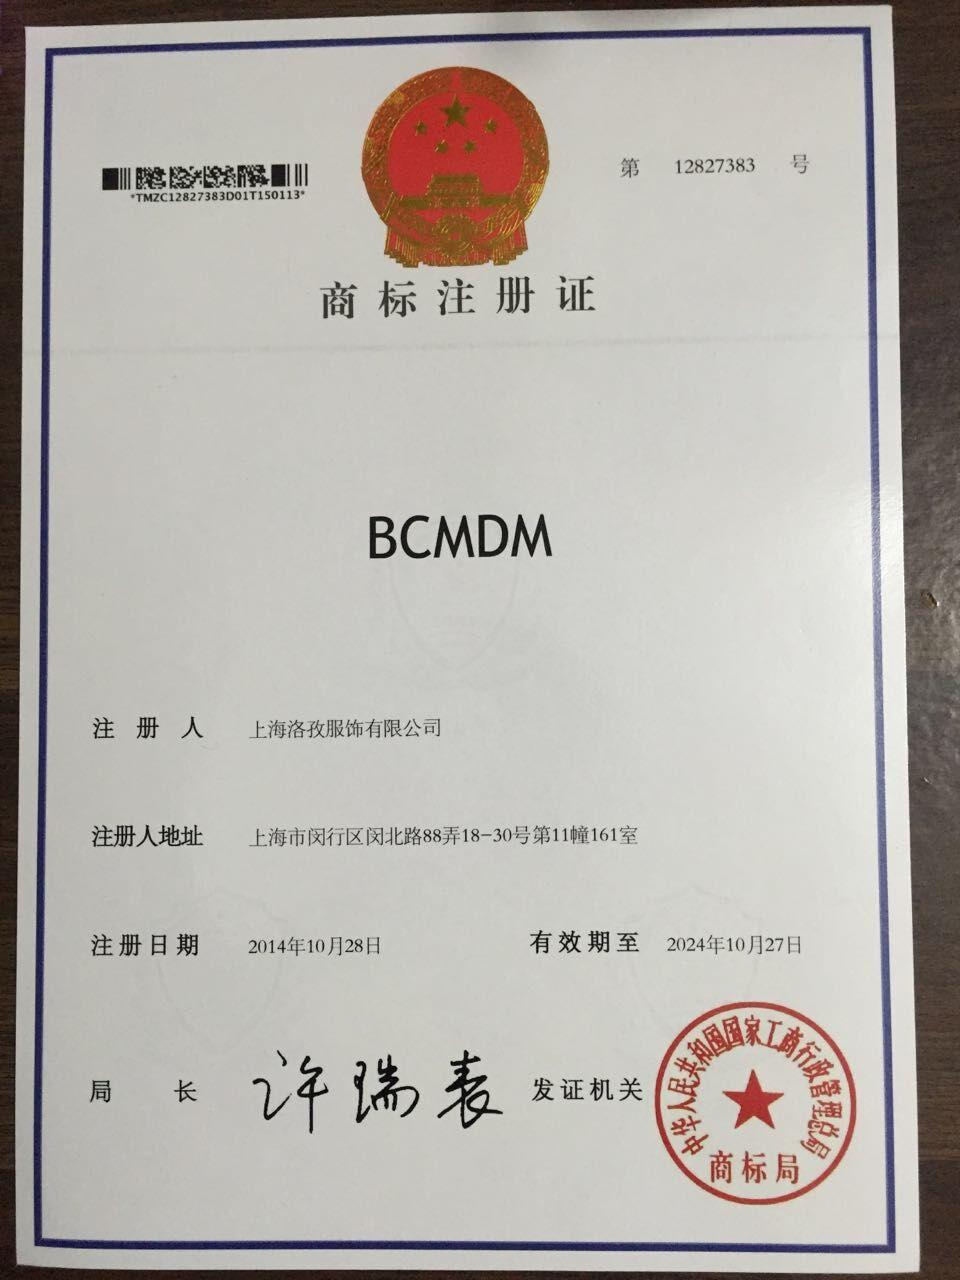 BCMDM